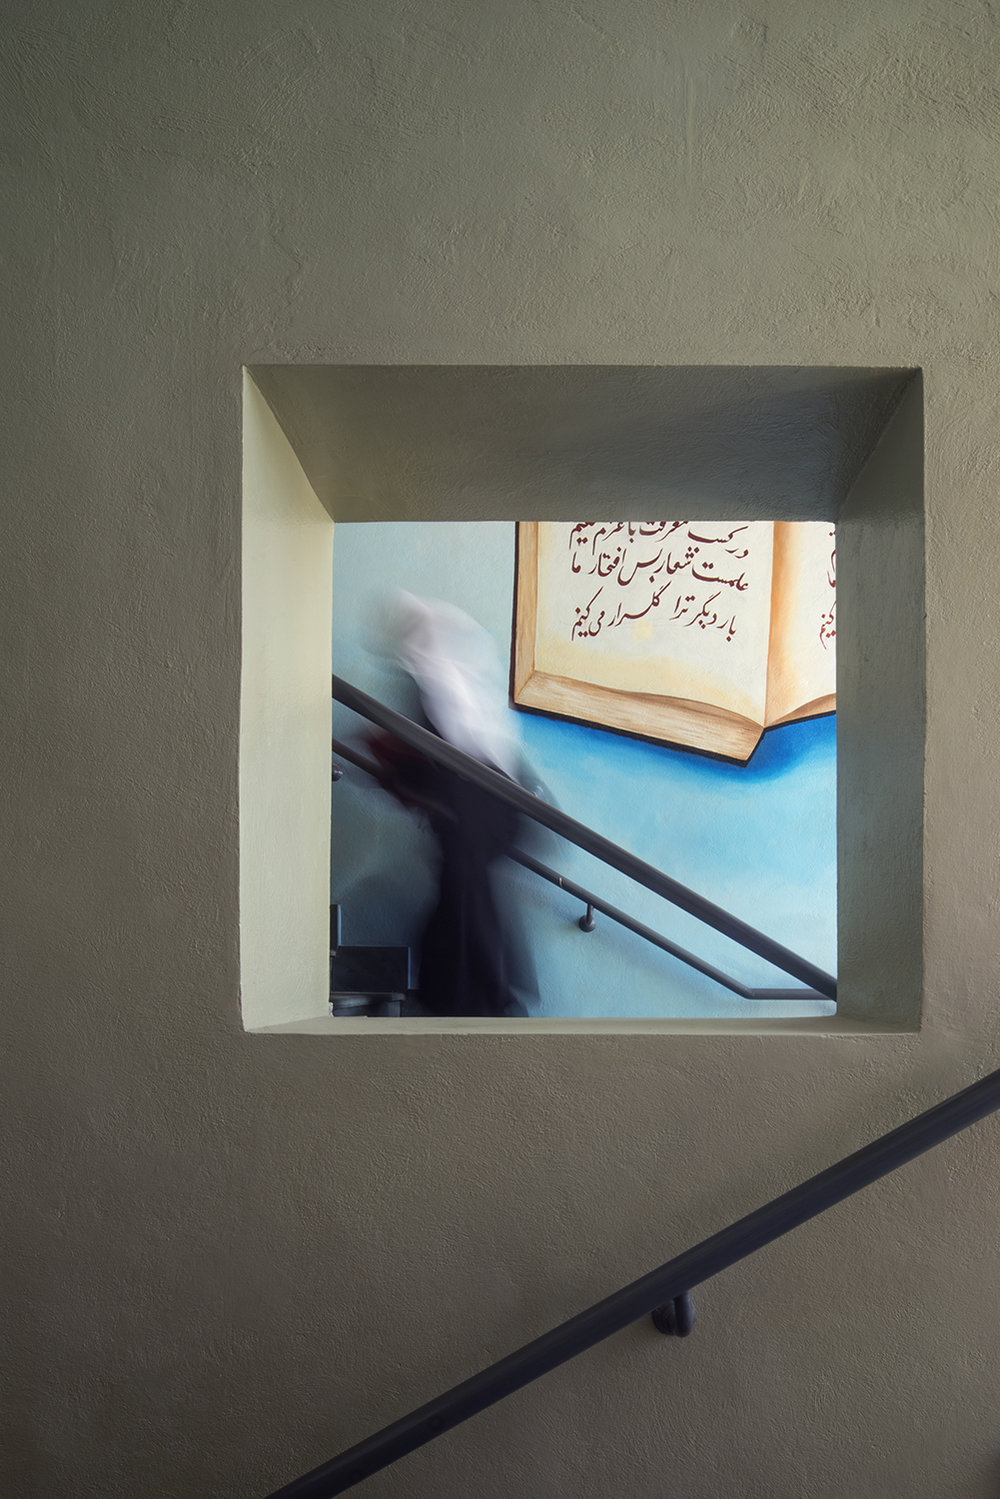 Goharkhatoon Girl School stair window@Nic Lehoux.jpg